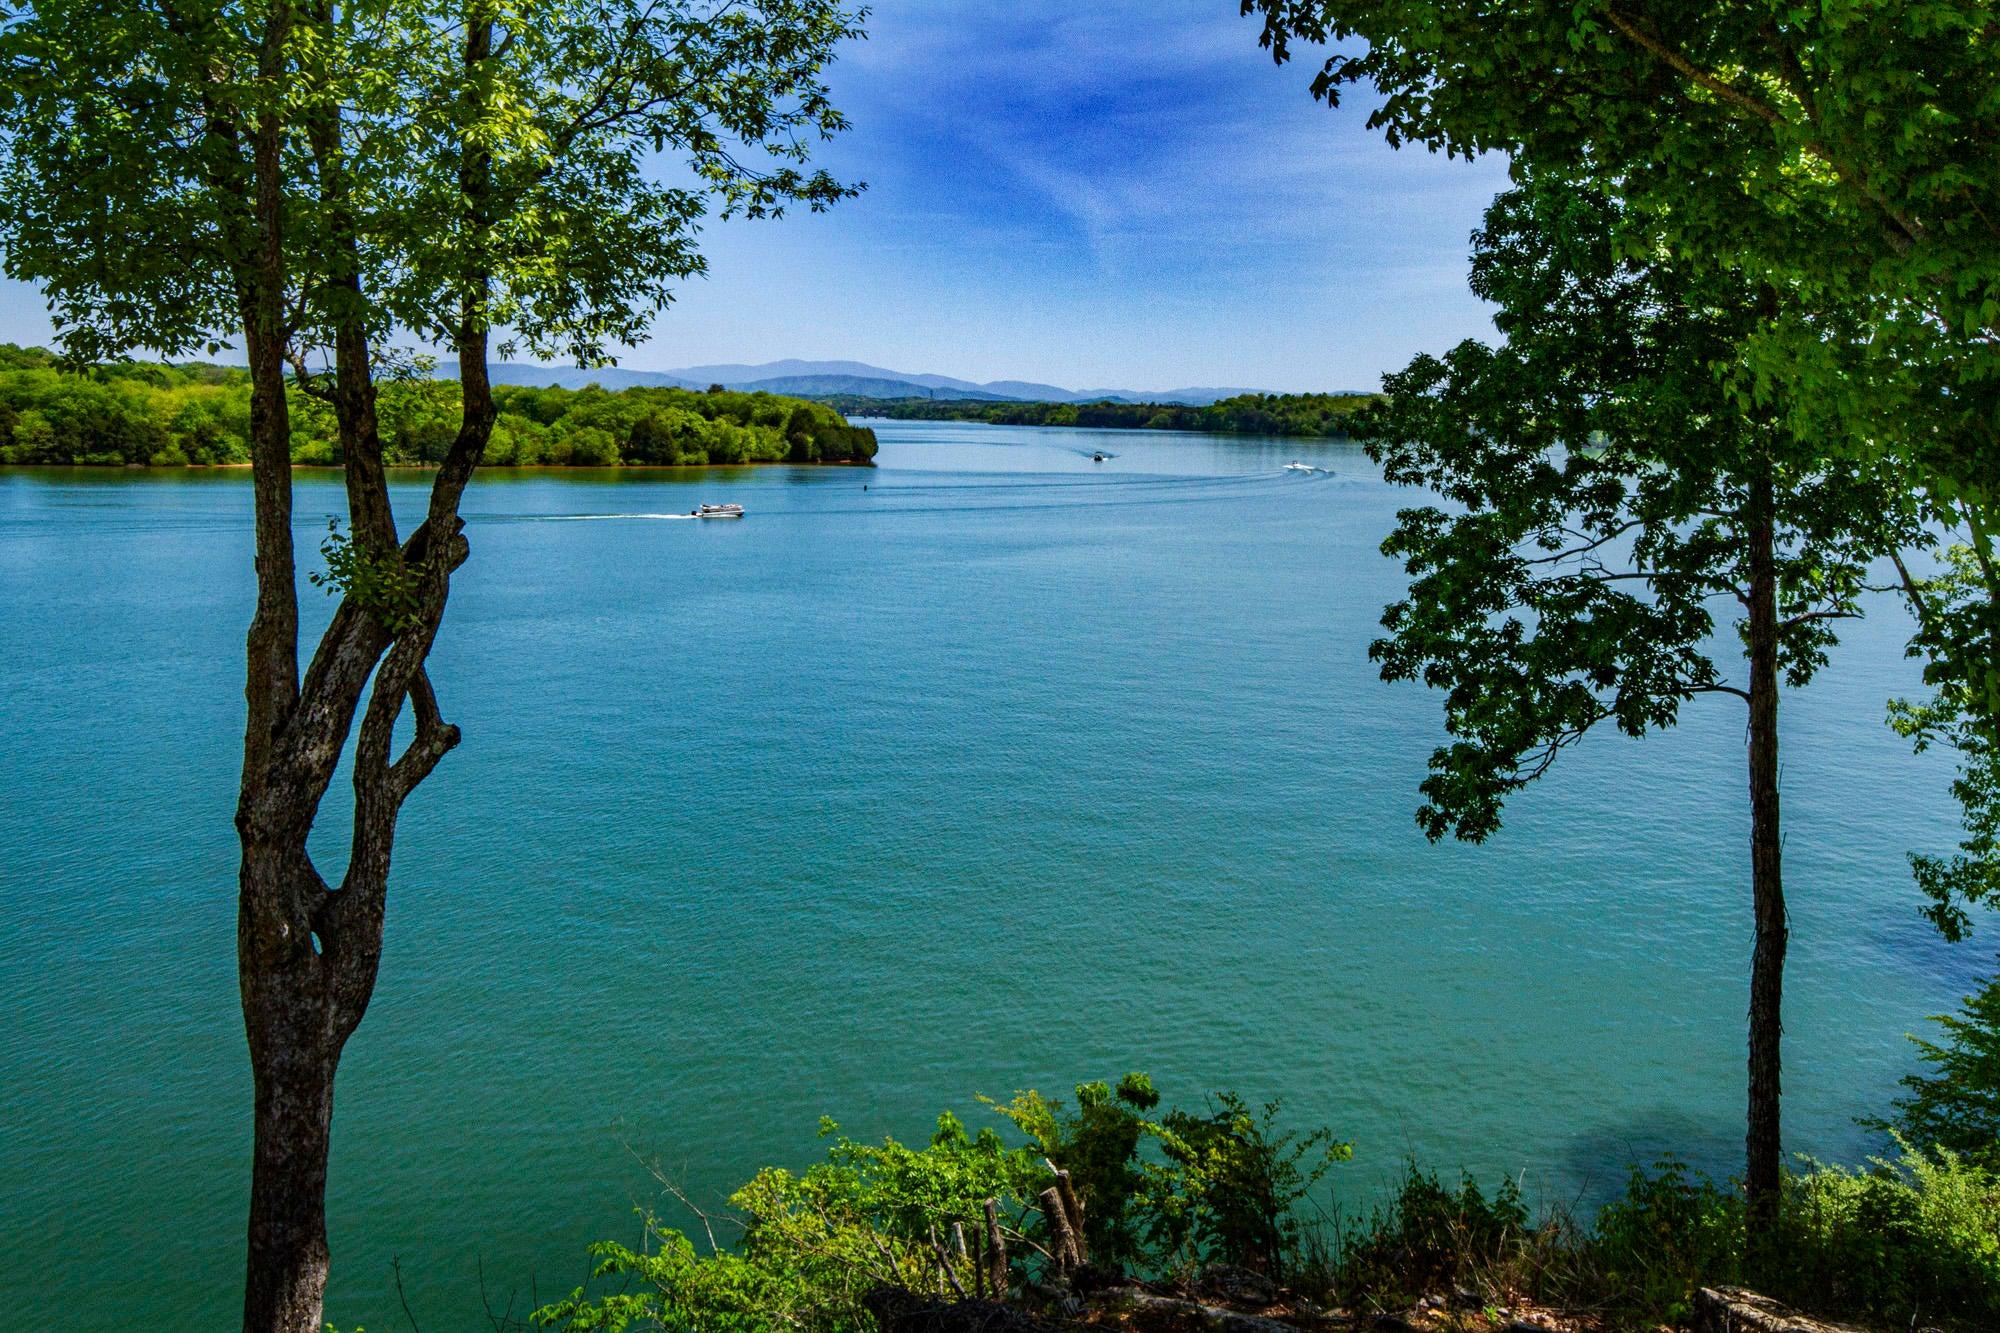 Breath-taking Lake & Mountain Views!